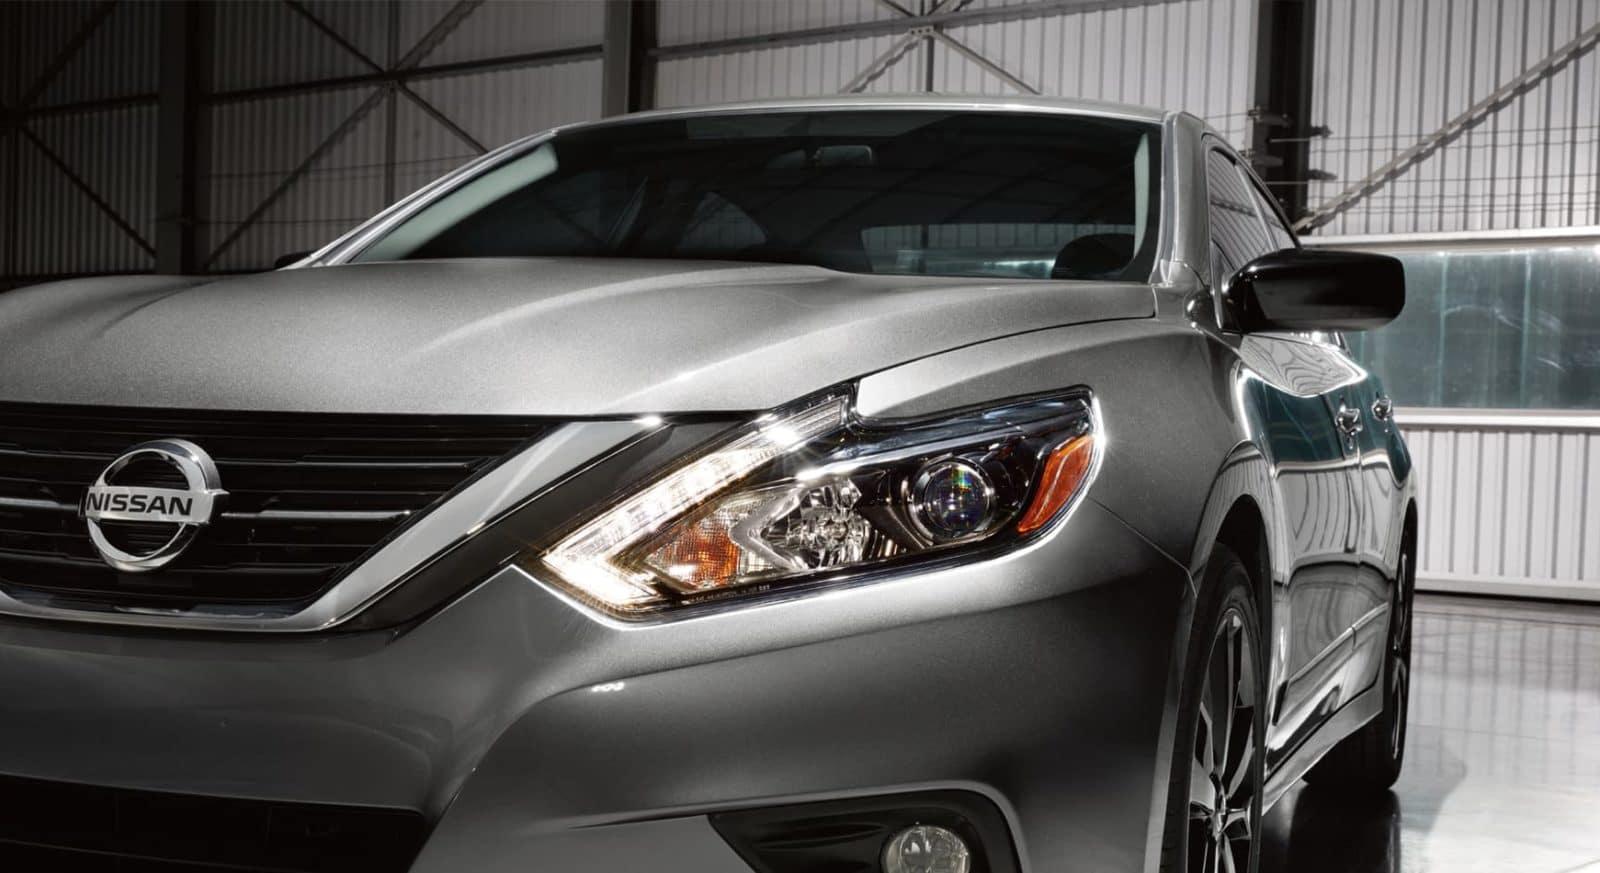 Nissan & Used Car Dealership - Durango, CO - Nissan of Durango